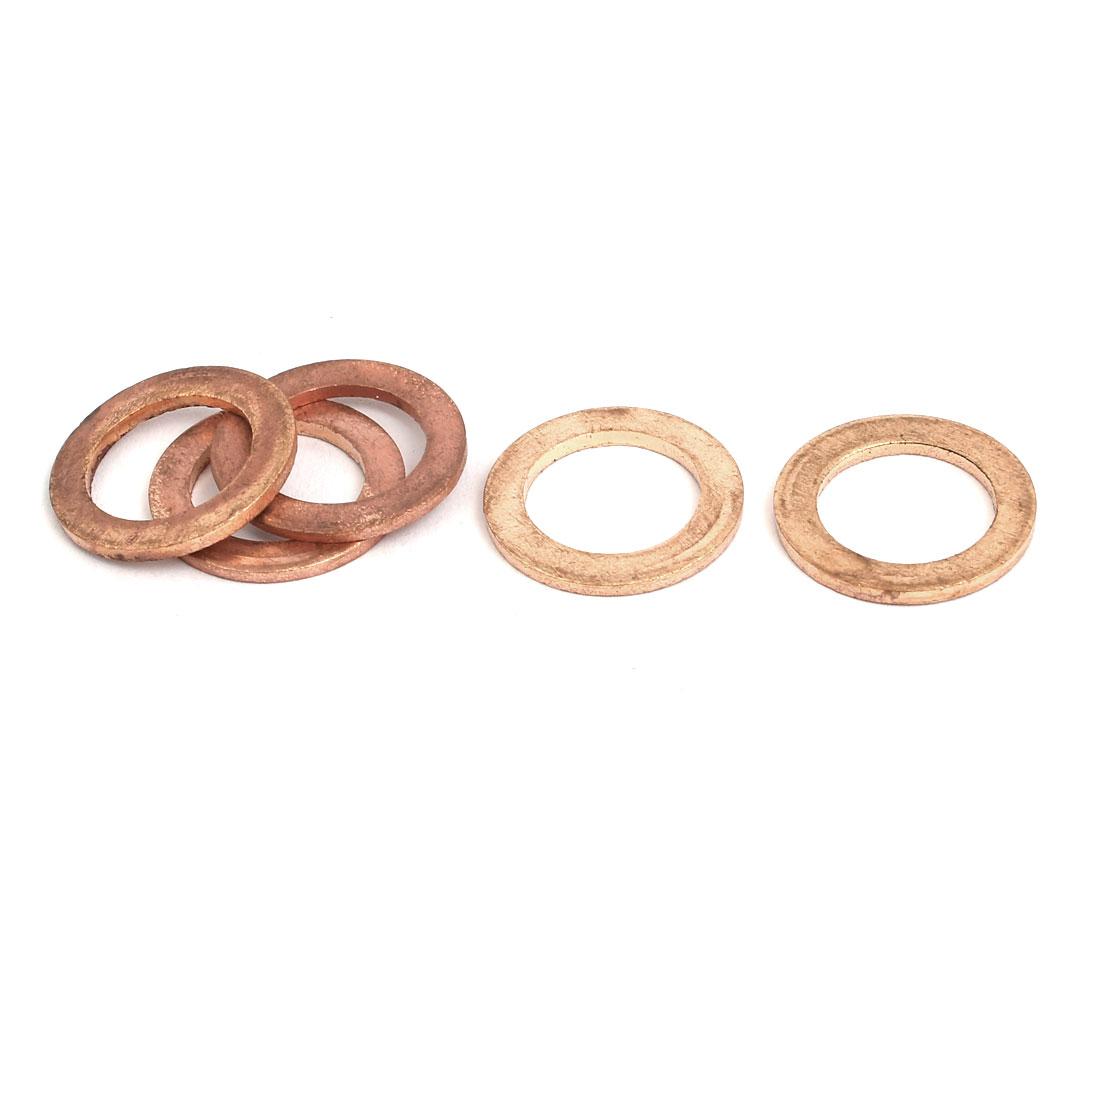 5pcs 12mmx20mmx1.5mm Copper Flat Ring Sealing Crush Washer Gasket